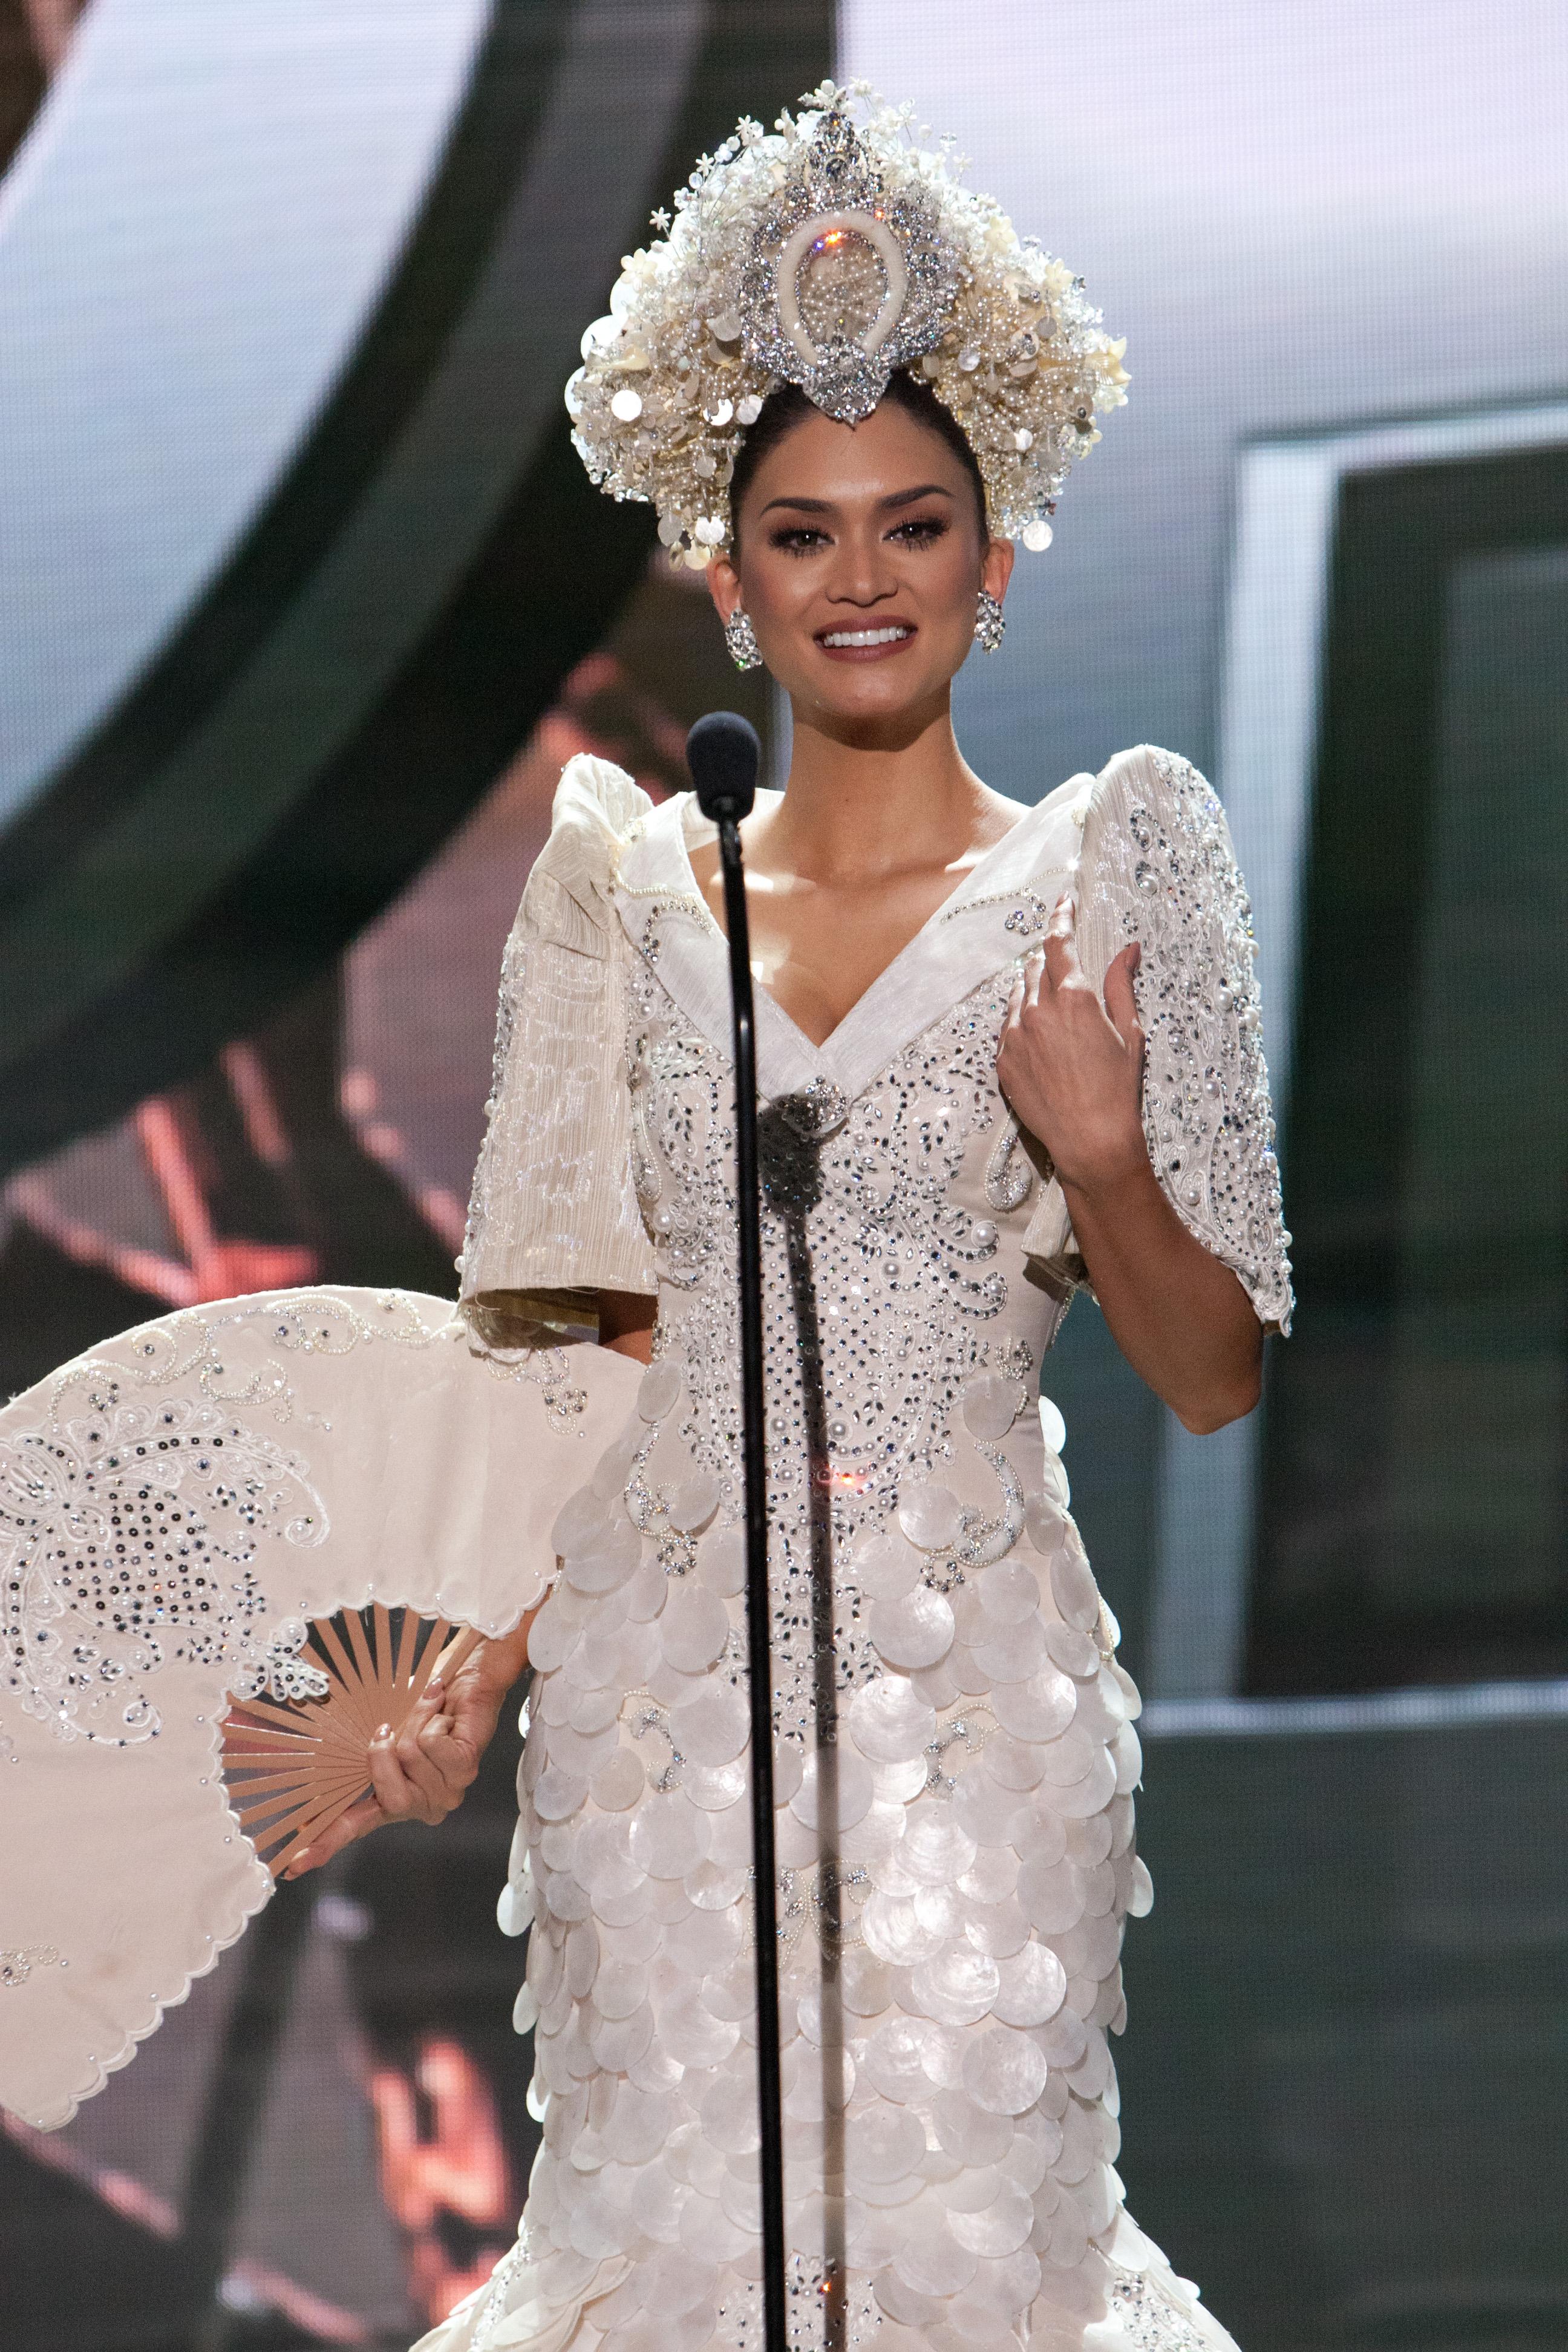 Miss Universe PH 2015 Pia Wurtzbach in Top 5 of final